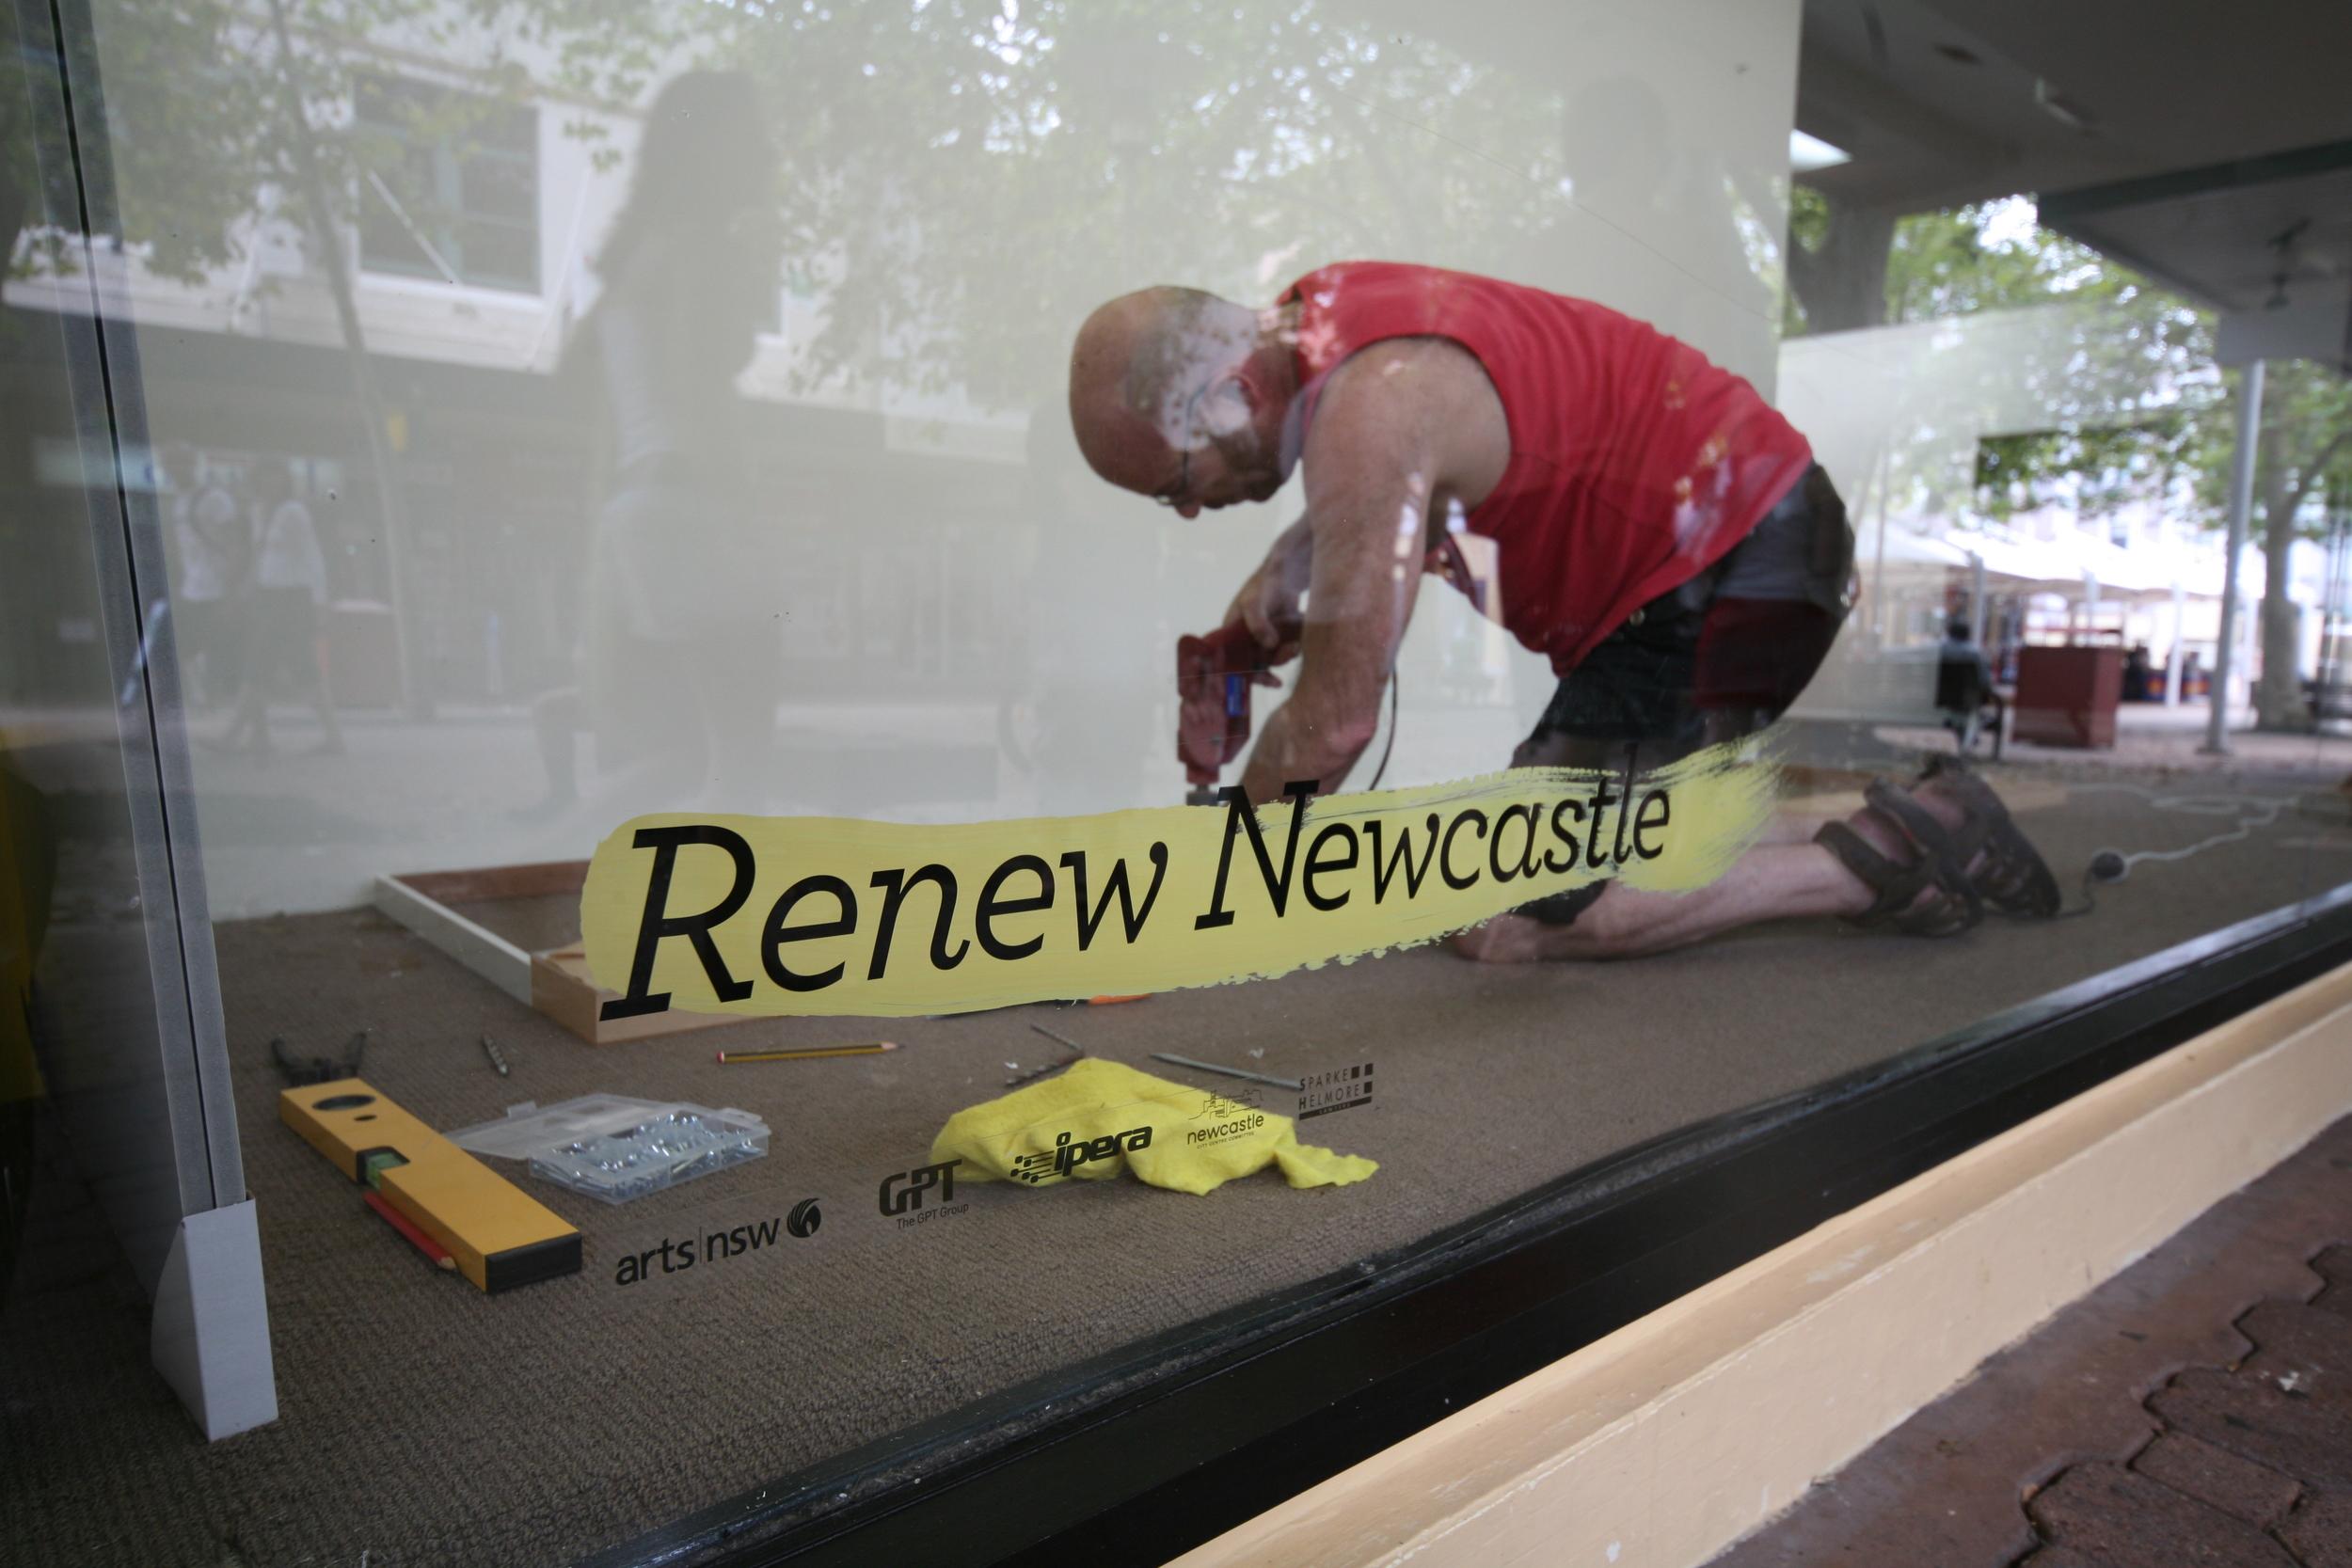 Renew newcastle.jpeg